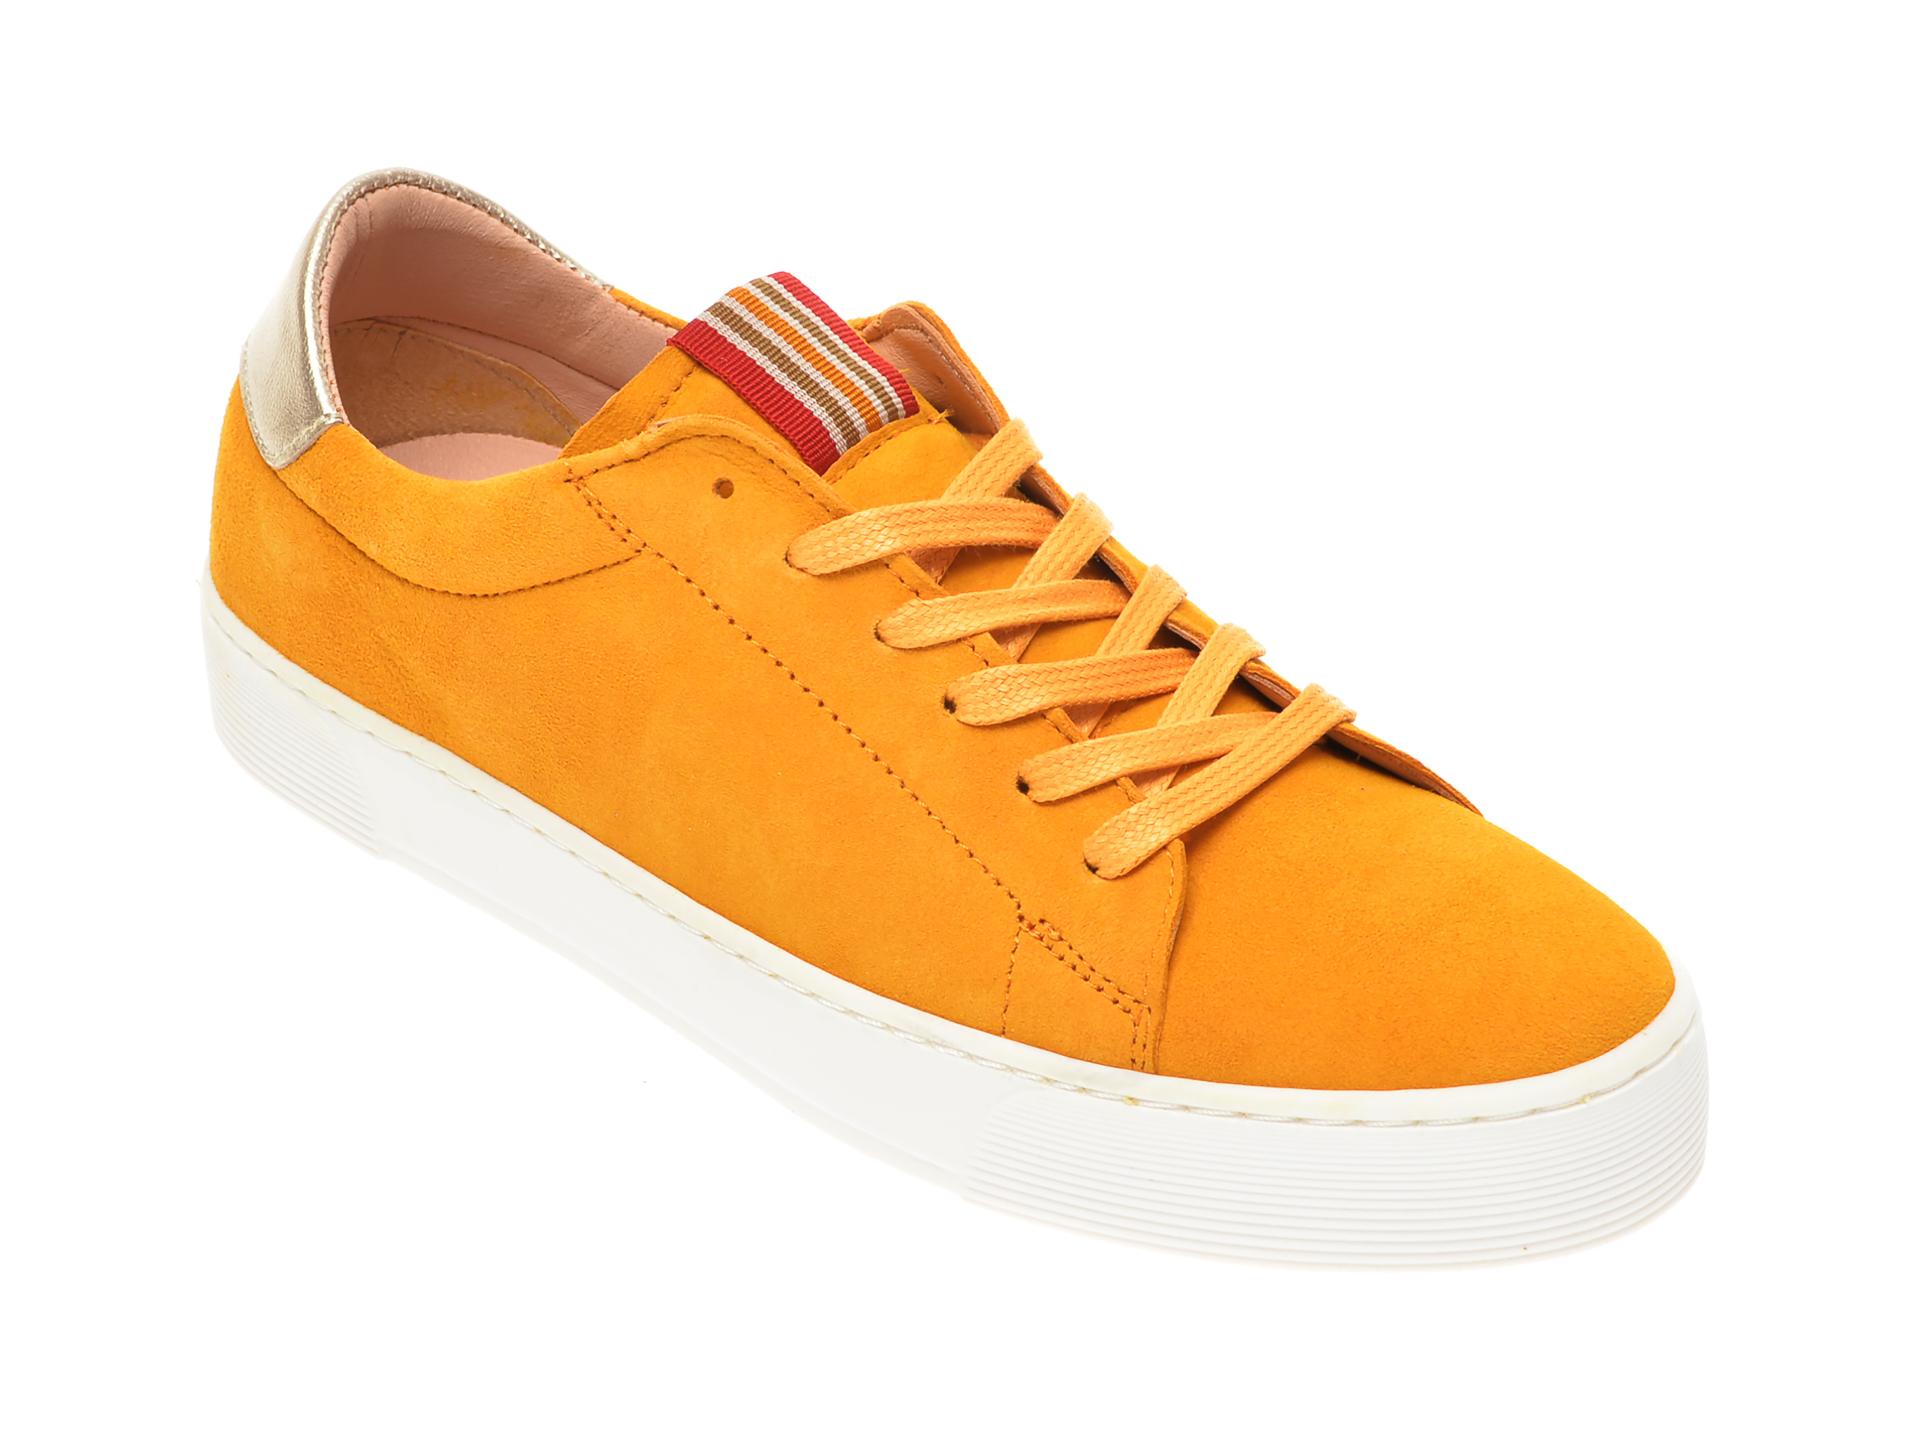 Pantofi sport SALAMANDER galbeni, 55301, din piele intoarsa